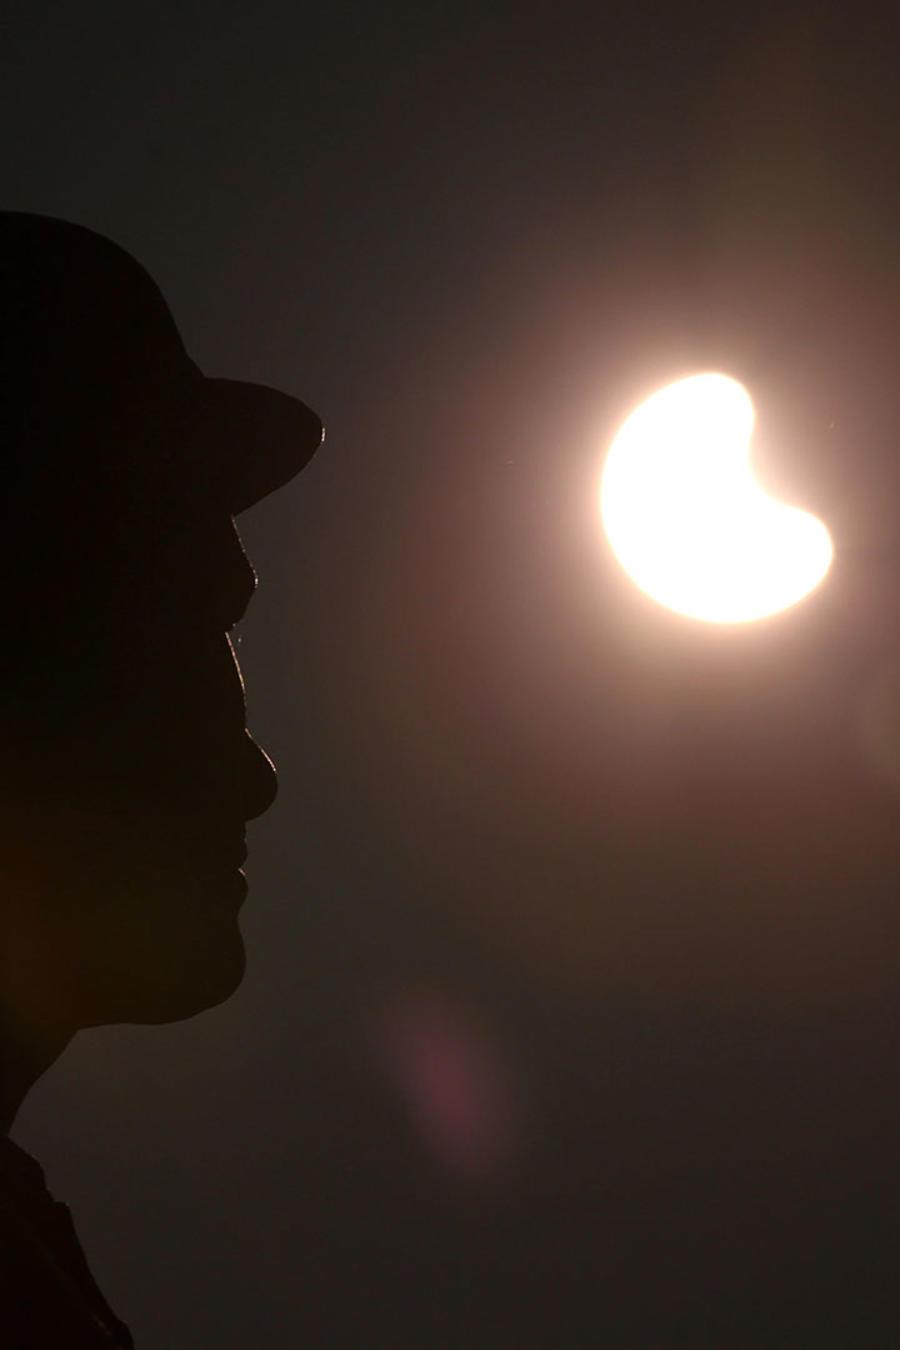 eclipse total sobre islas